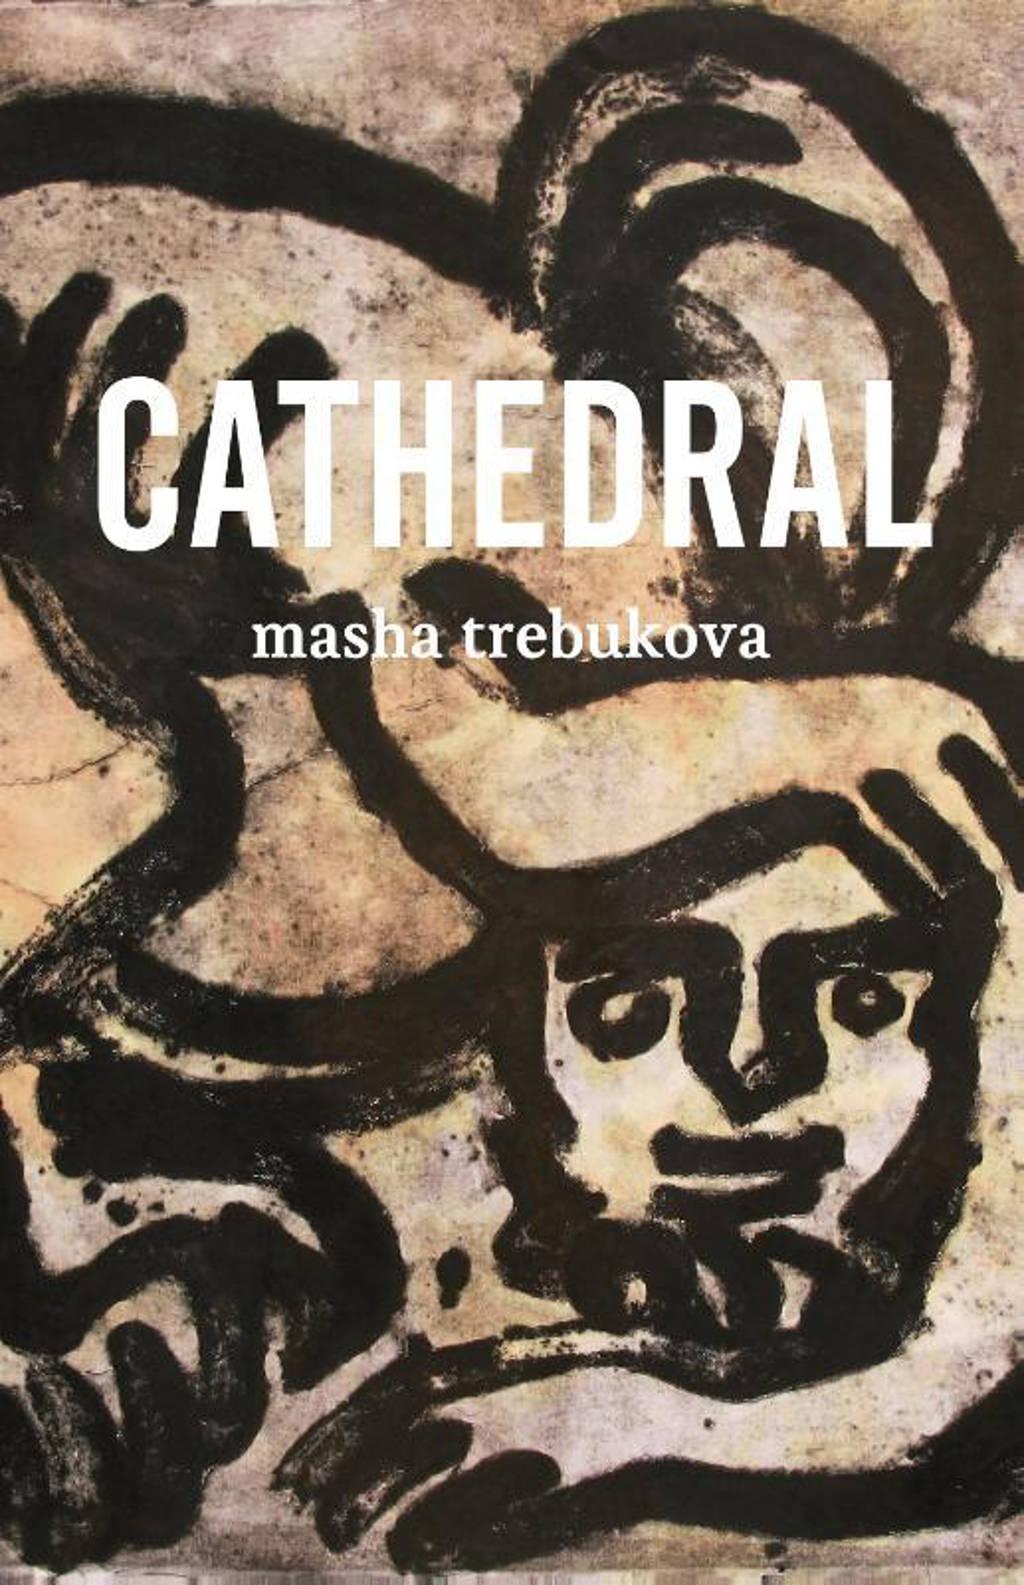 Cathedral - Masha Trebukova, Henk van Os en Marike van der Knaap